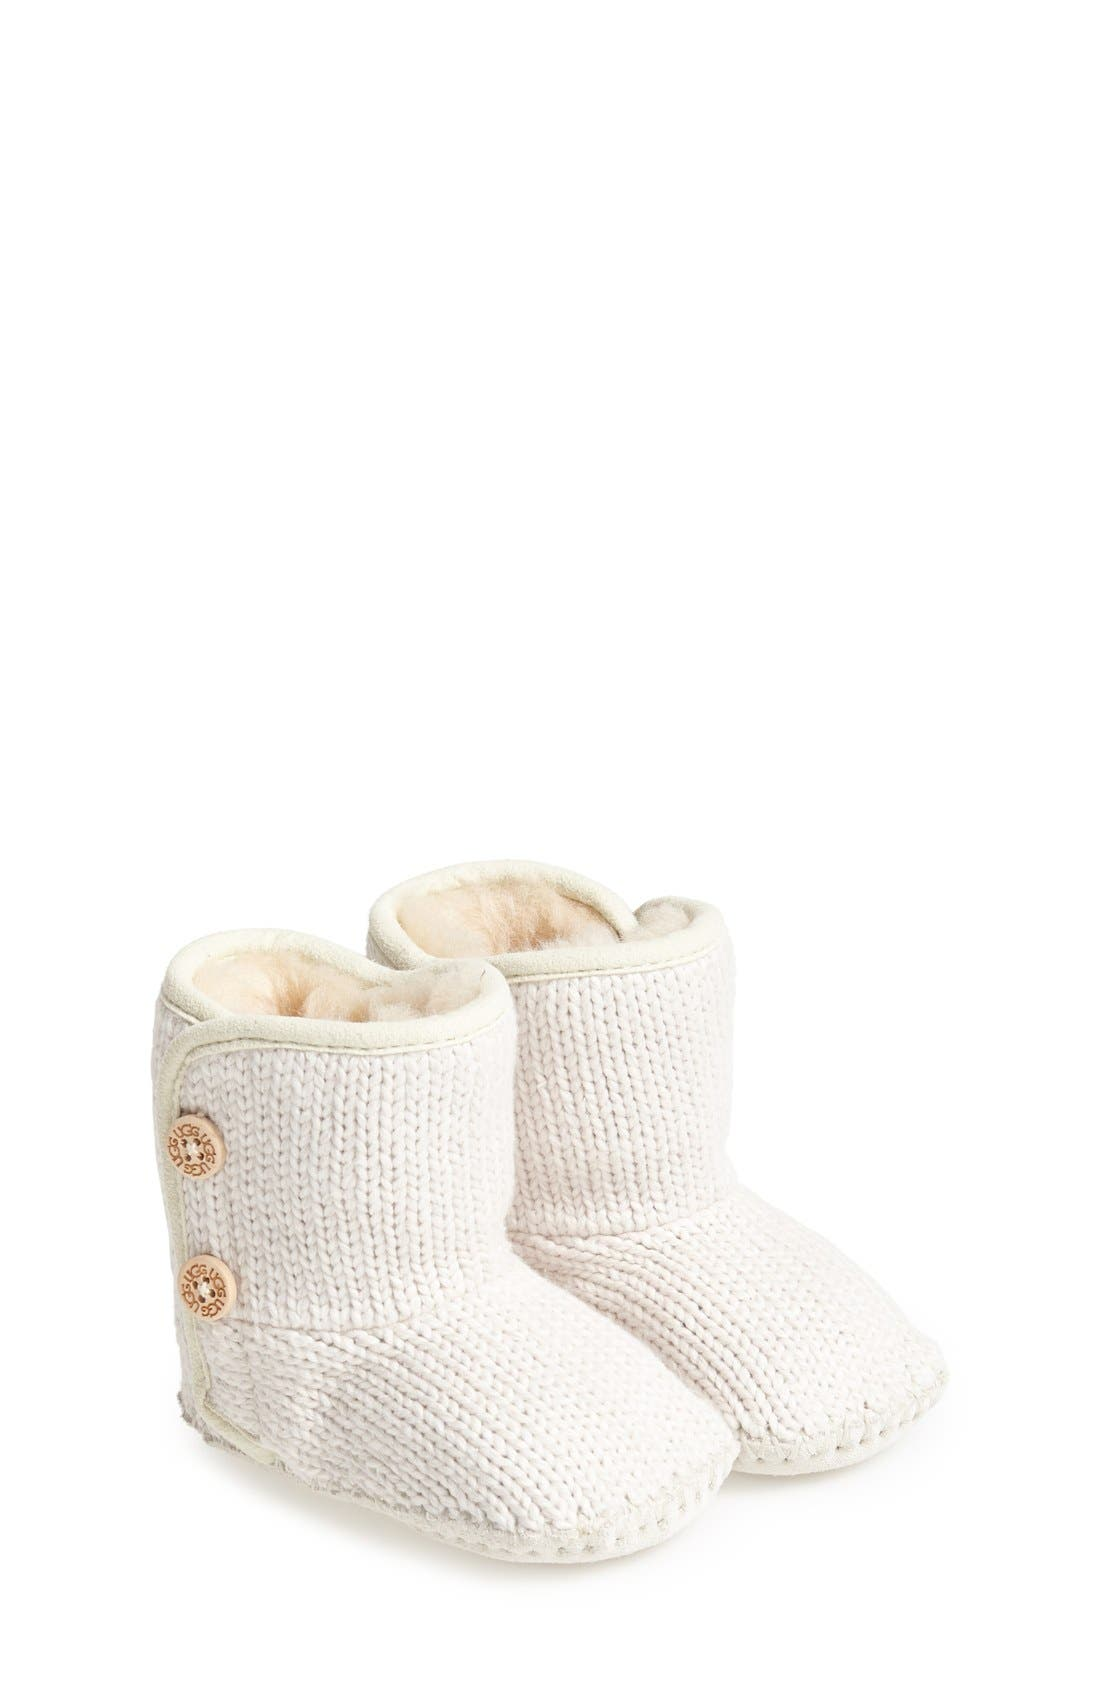 Purl Knit Bootie,                         Main,                         color, 924